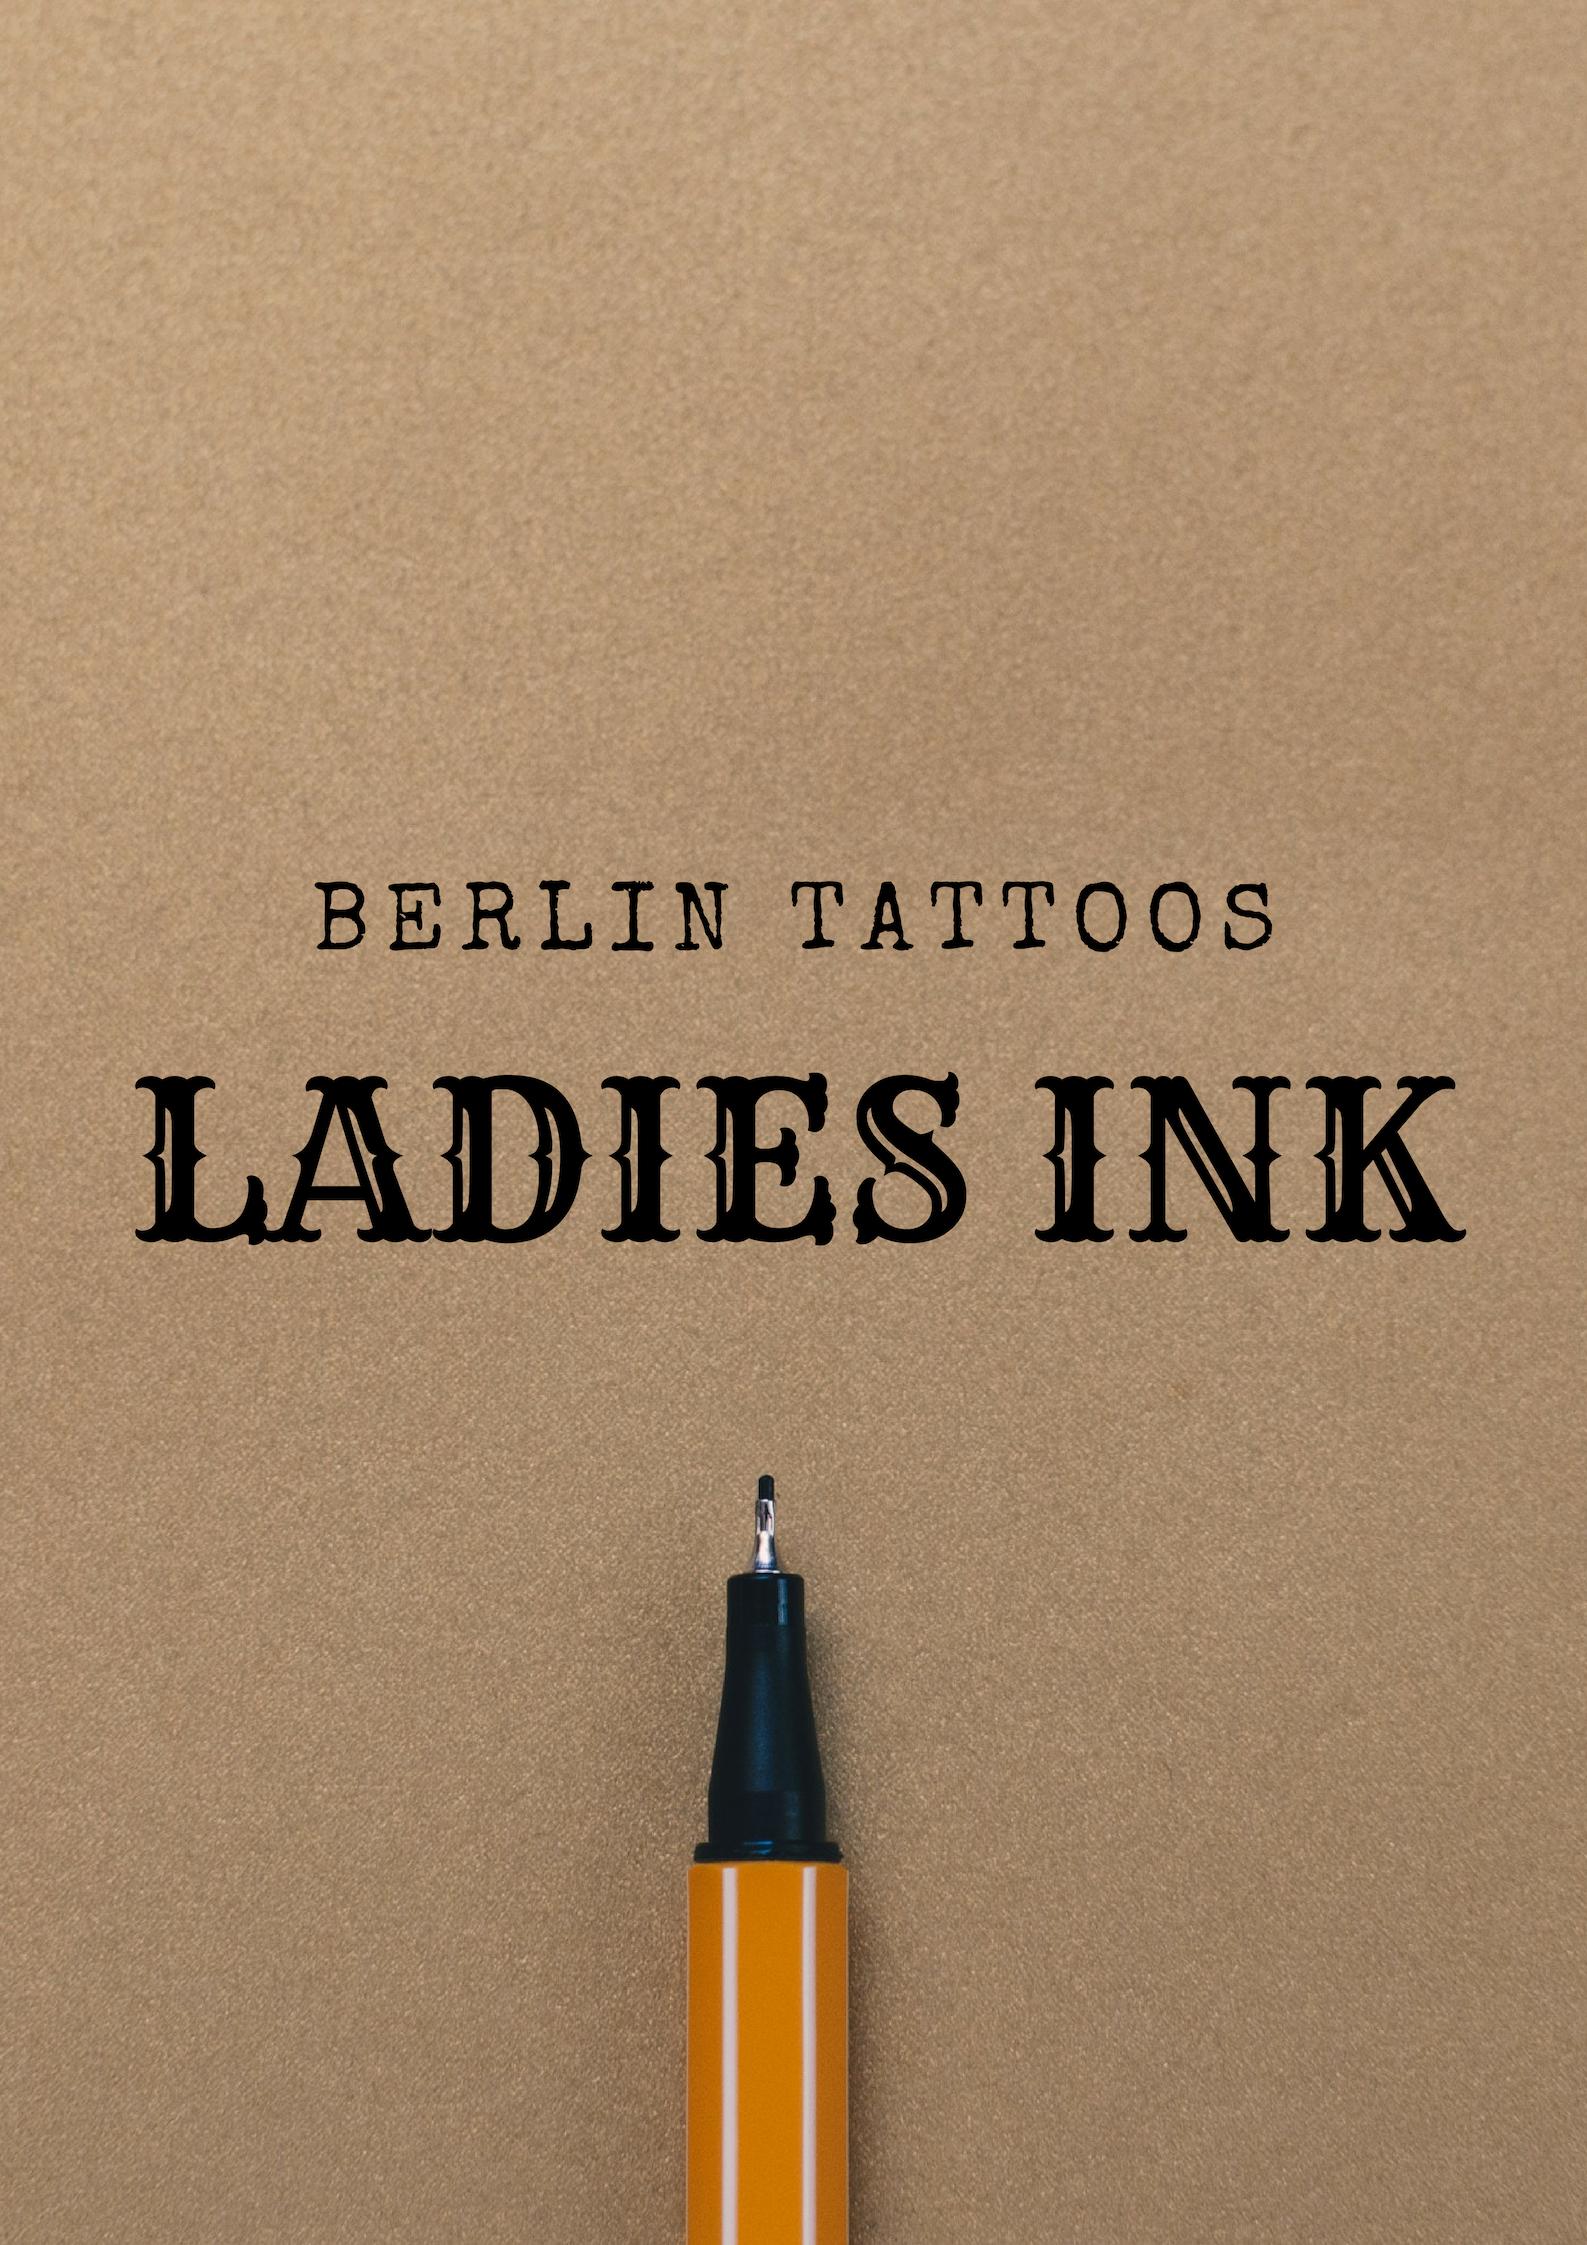 tattoo studios in berlin